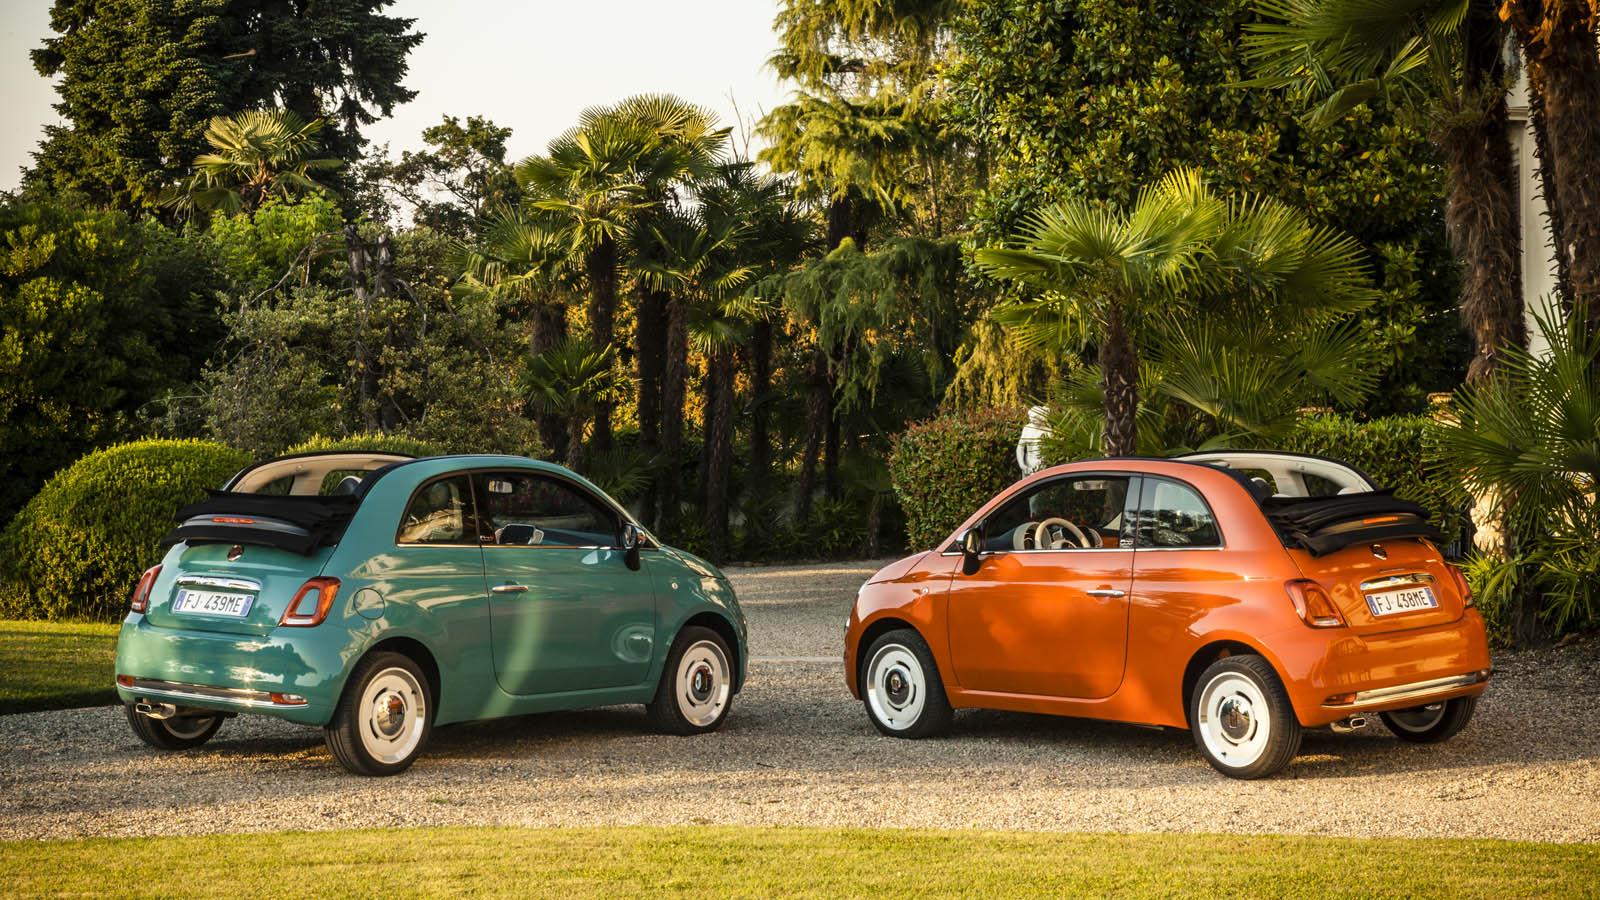 Fiat 500 Anniversario Edition (2)